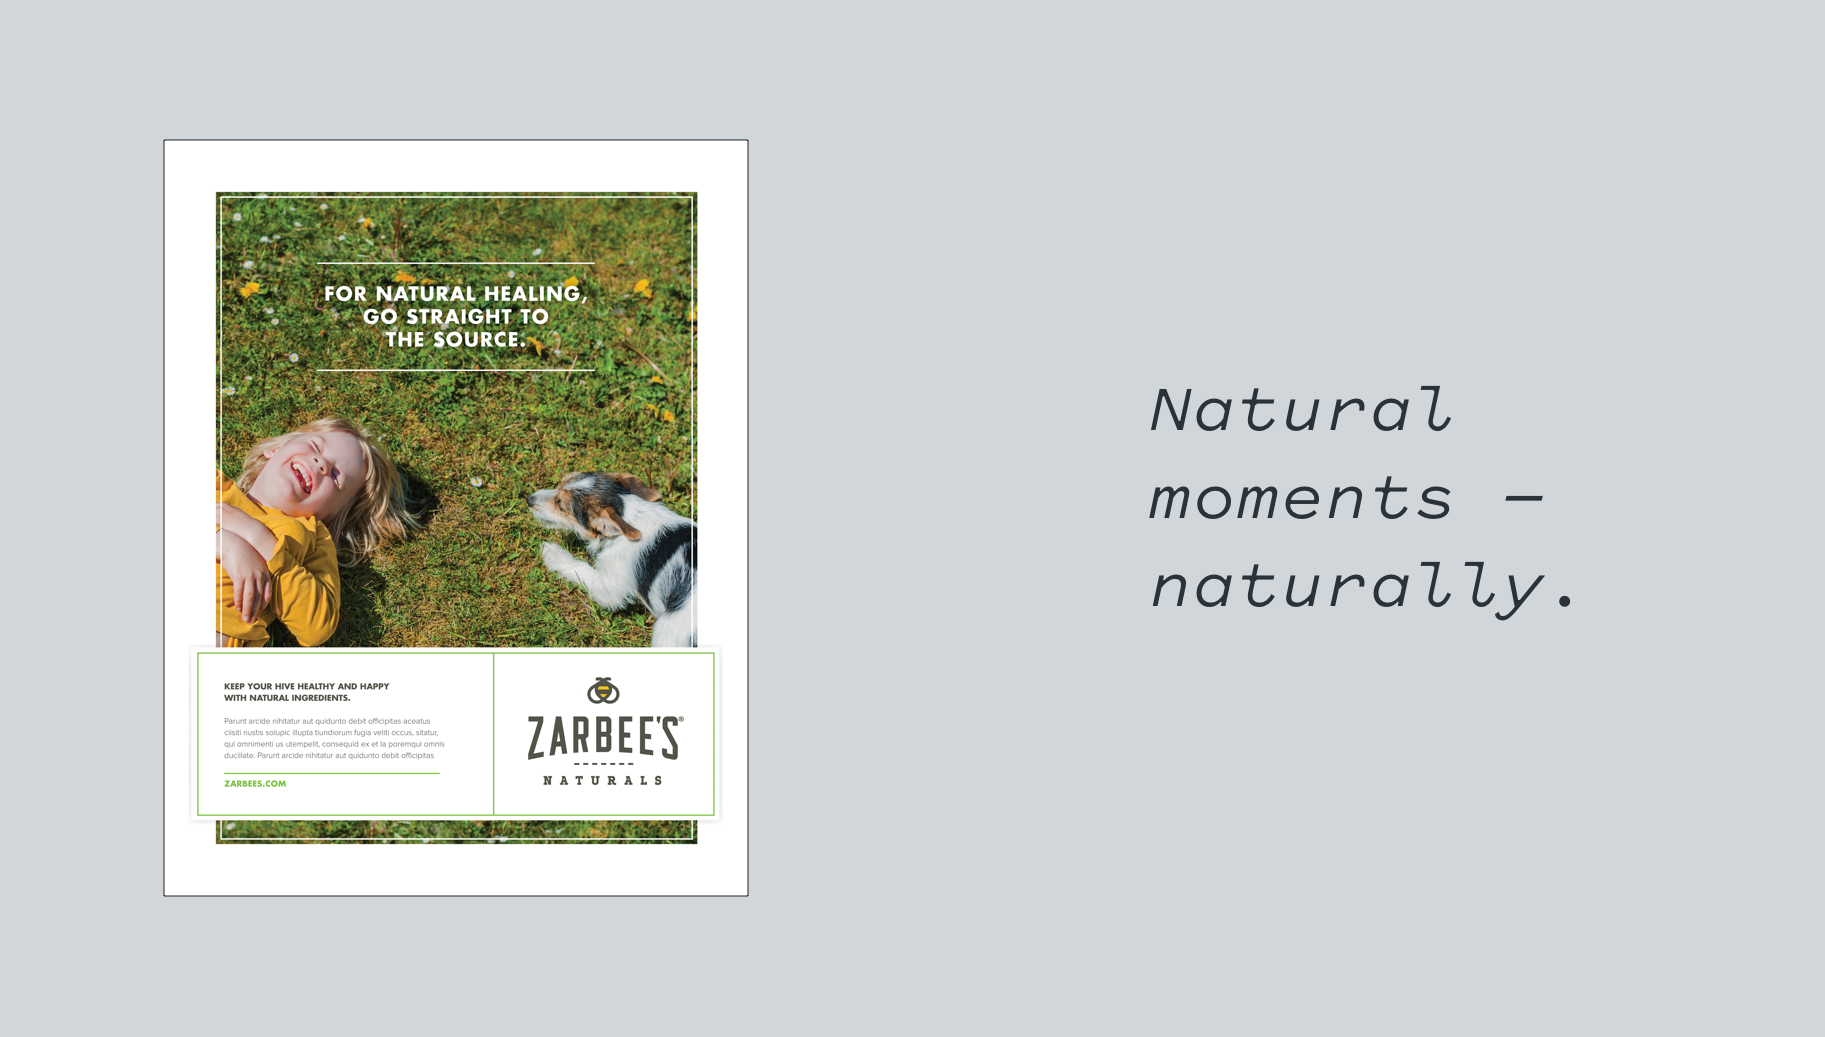 Zarbee's Naturals brand advertising